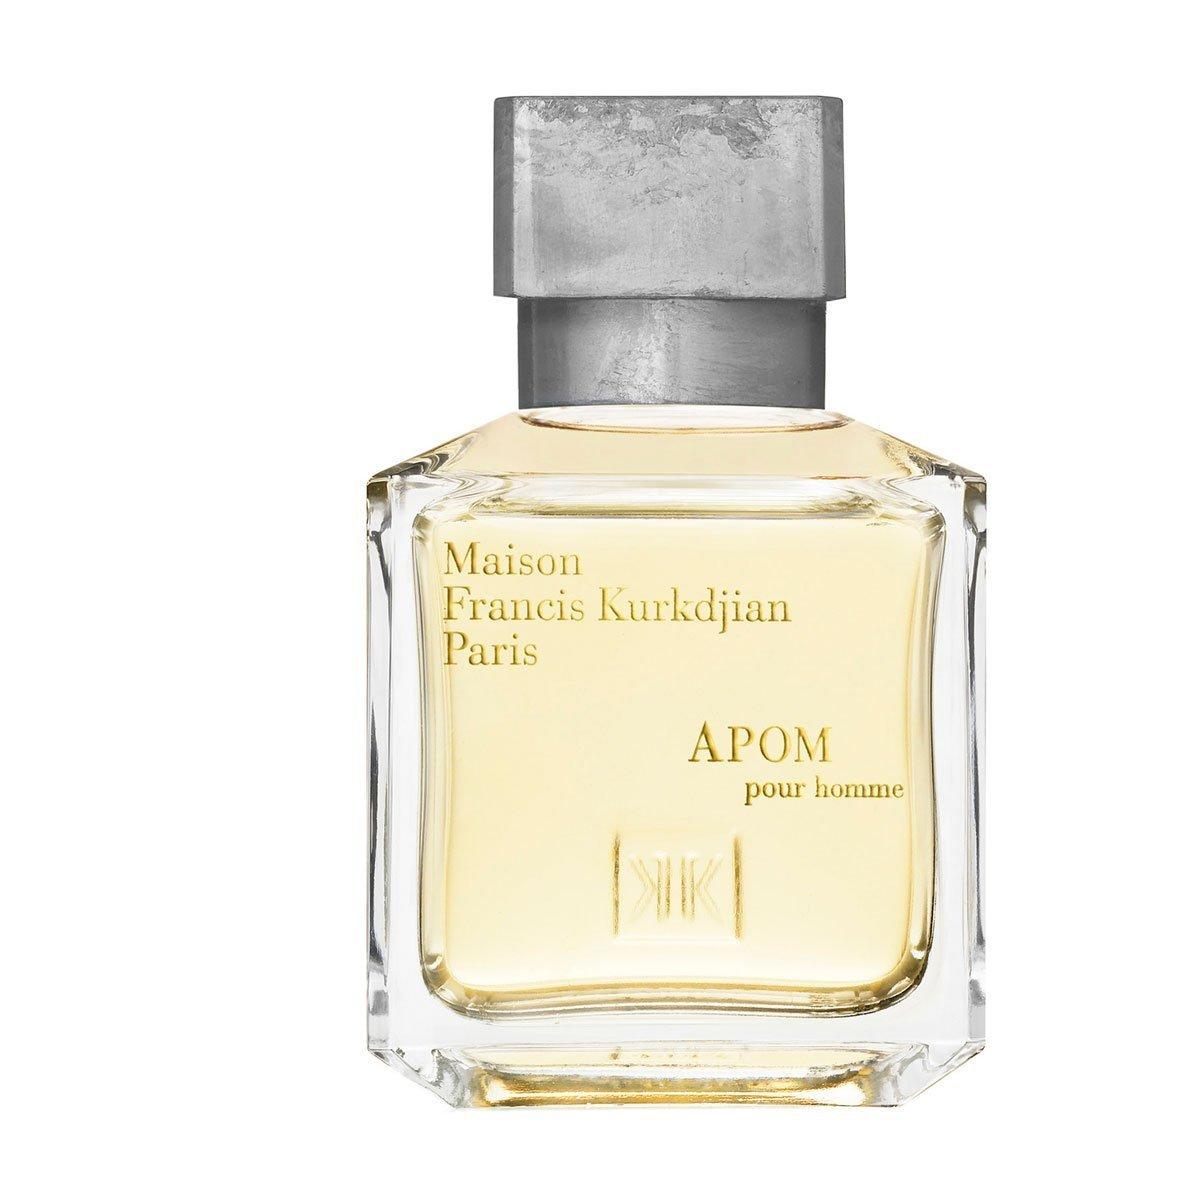 APOM by FRANCIS KURKDJIAN 5ml Travel Spray Perfume Orange Cedar Amber HOMME